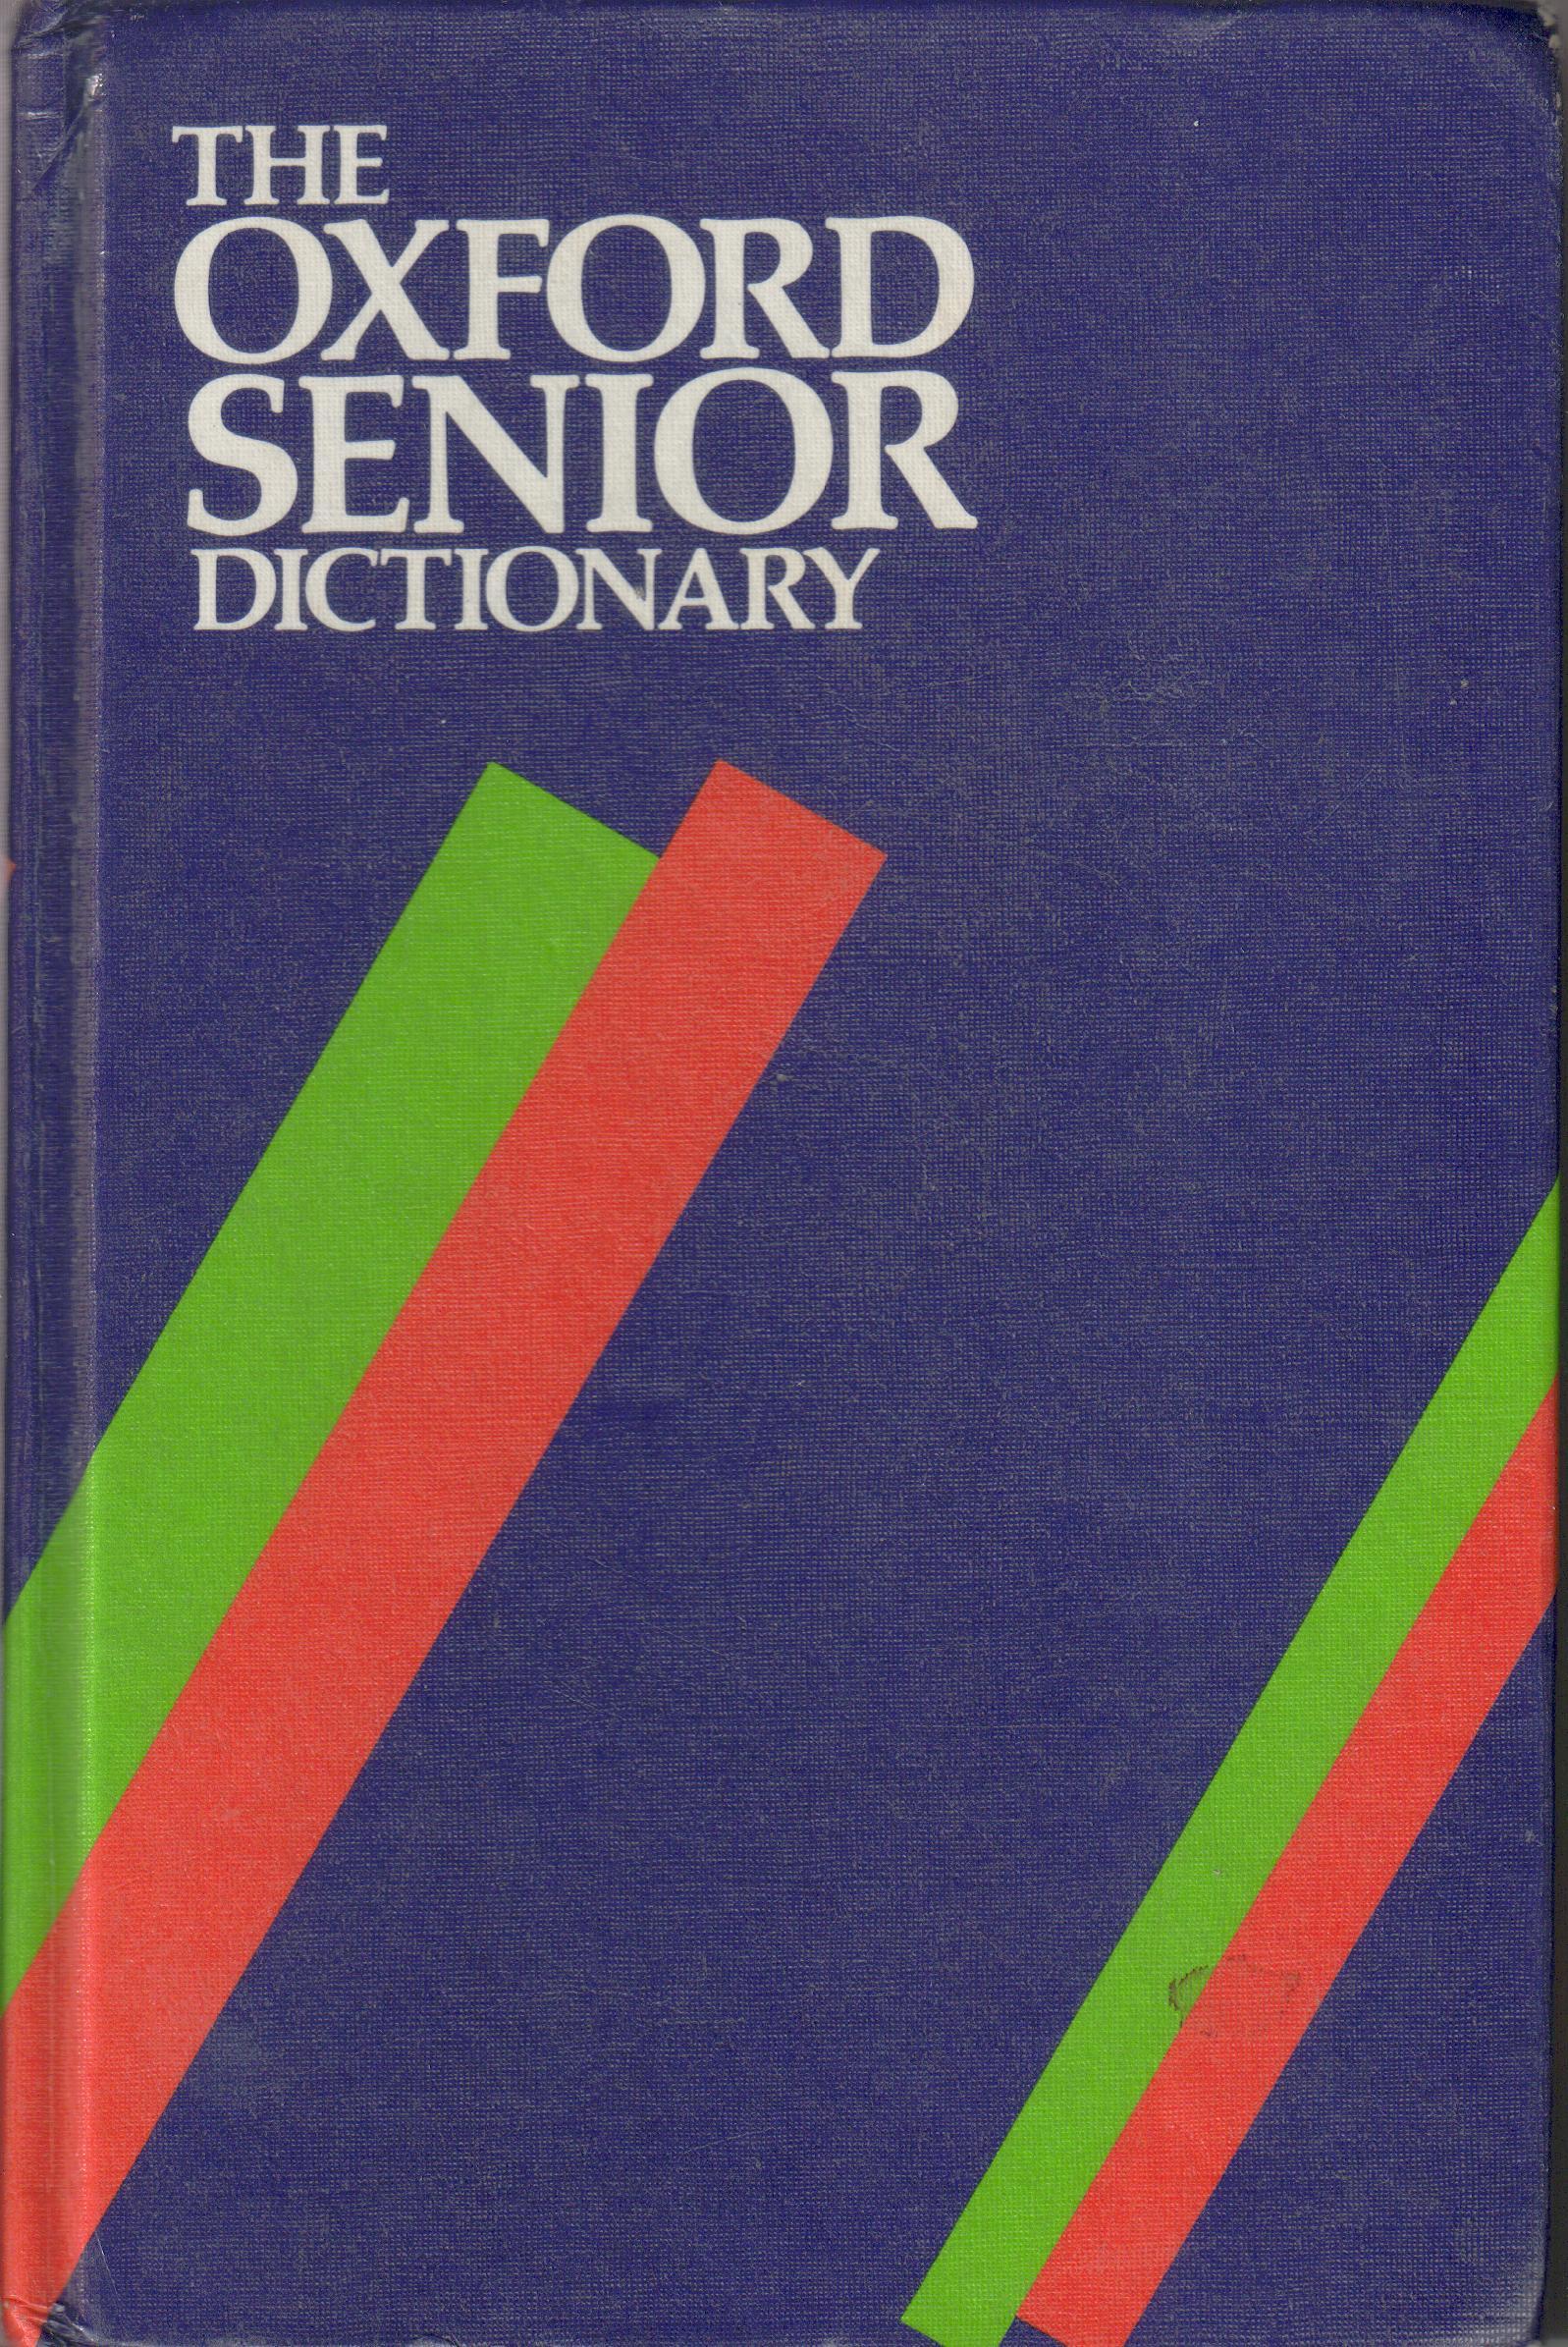 The Oxford Senior Dictionary